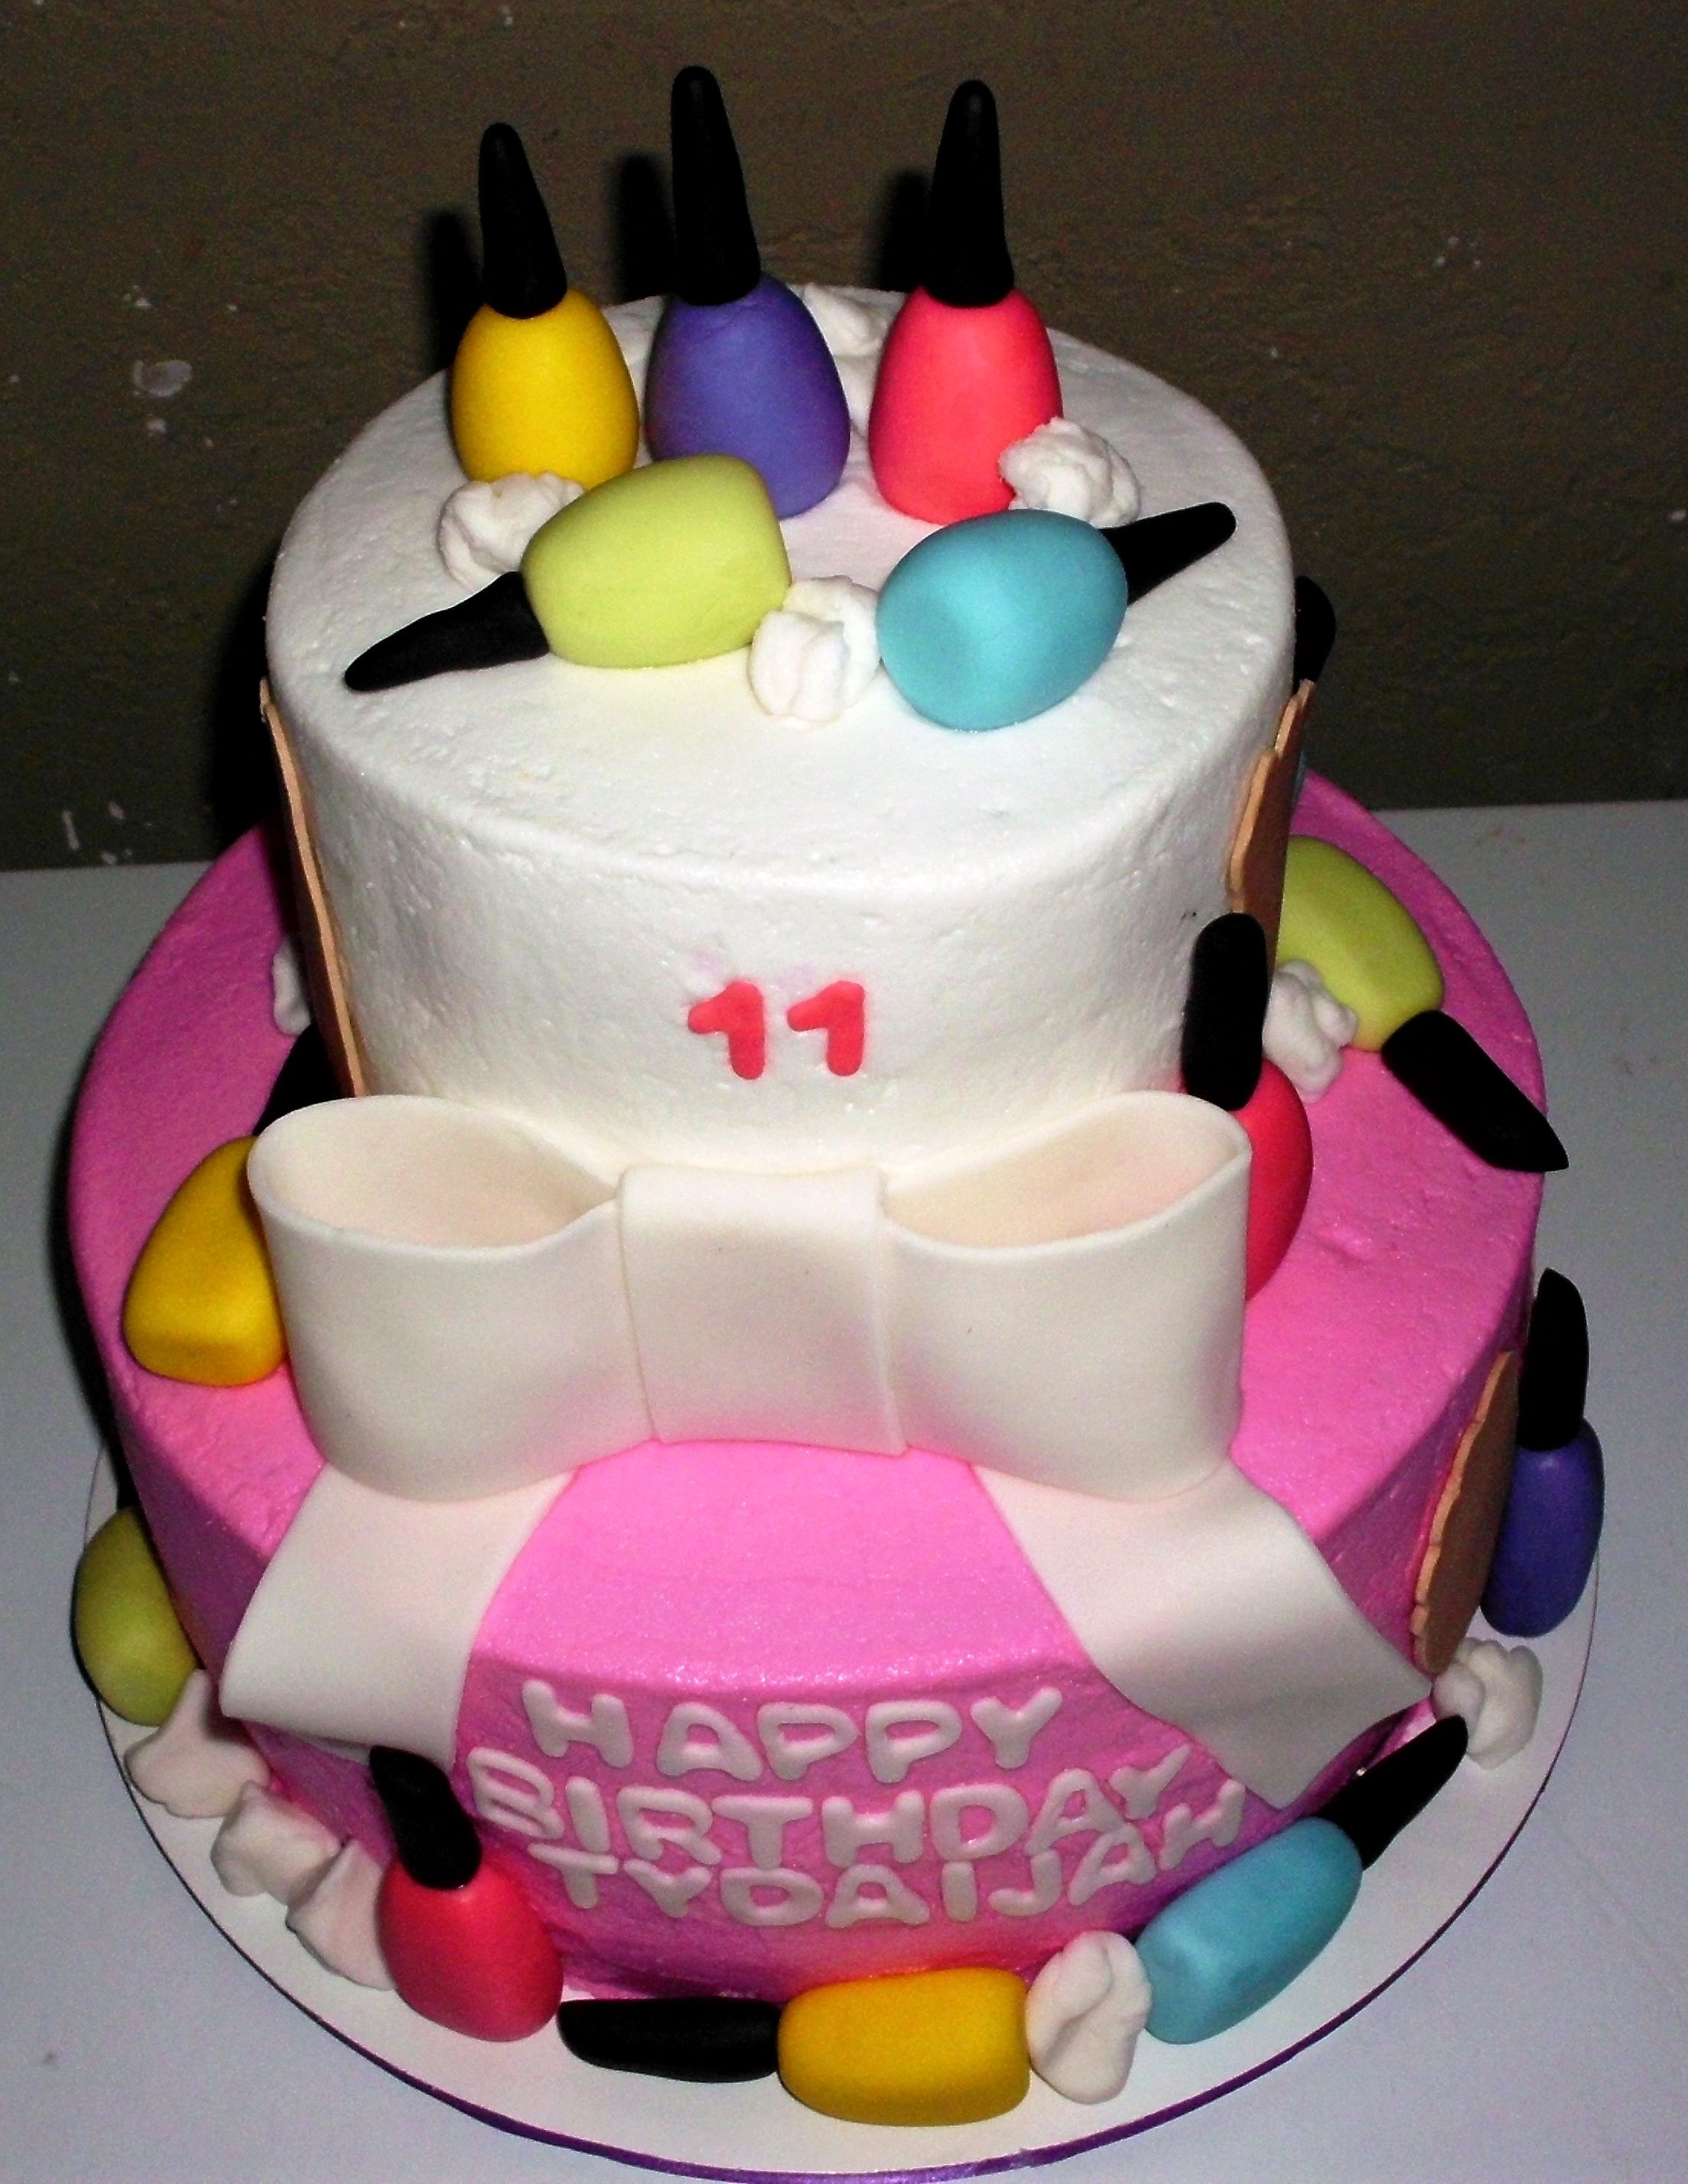 Nail Polish Cake Idea....   cakes   Pinterest   Cake, Birthday cakes ...